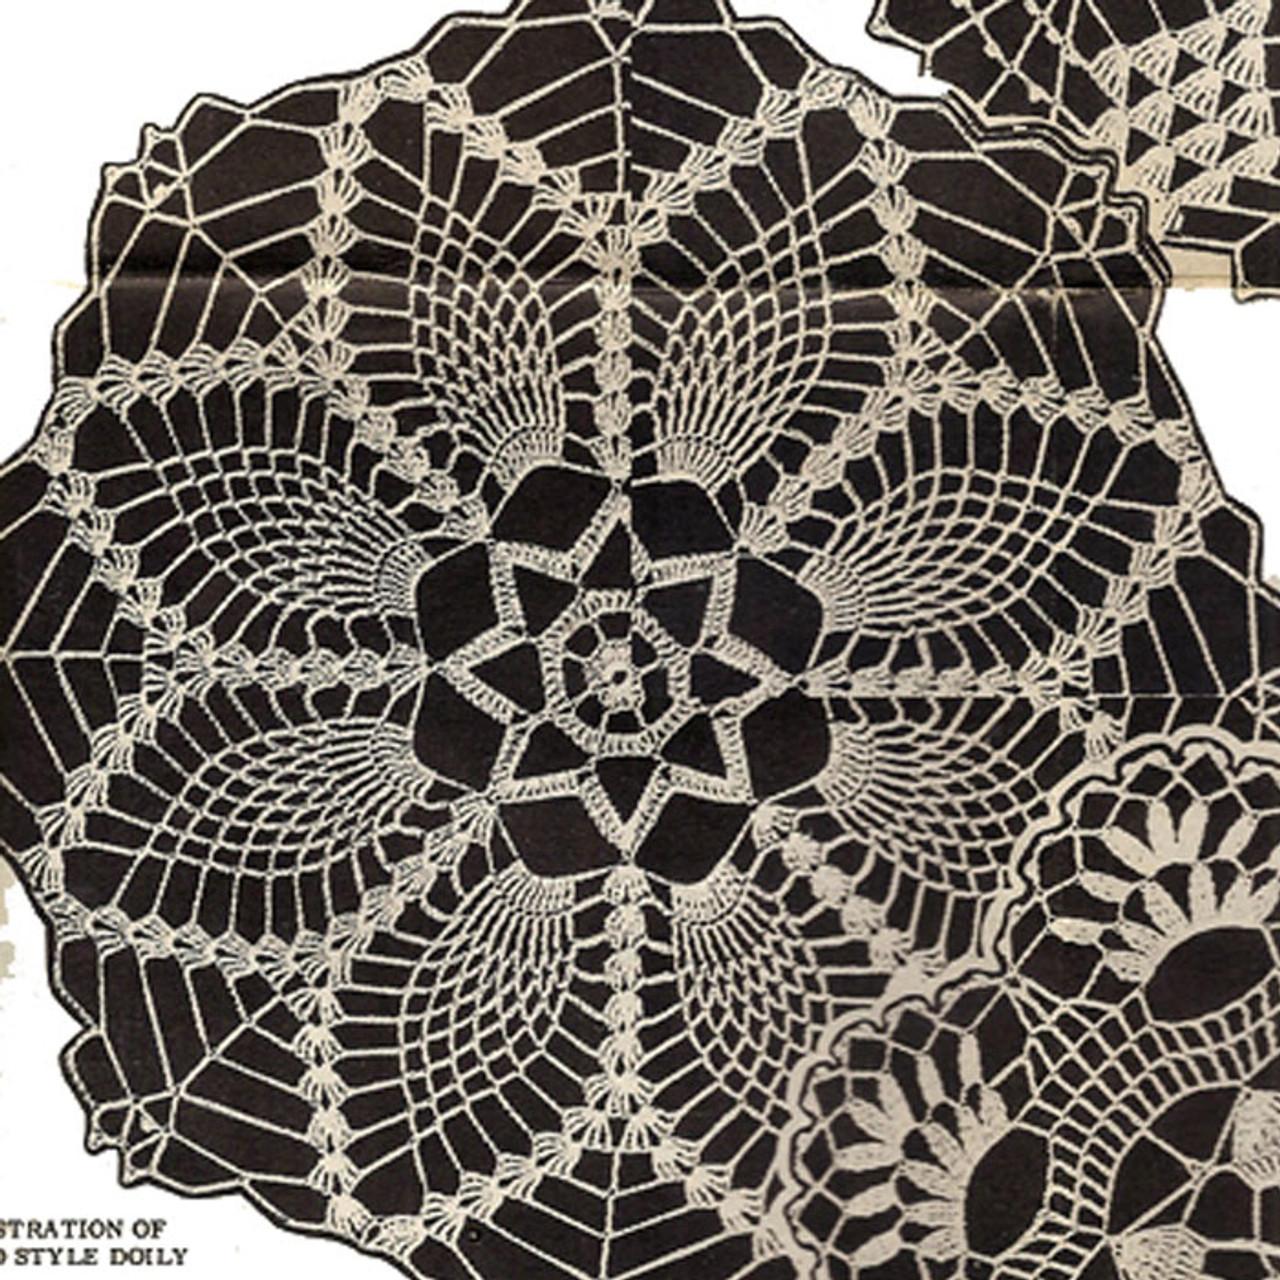 Vintage Crochet Pineapple Doily Pattern